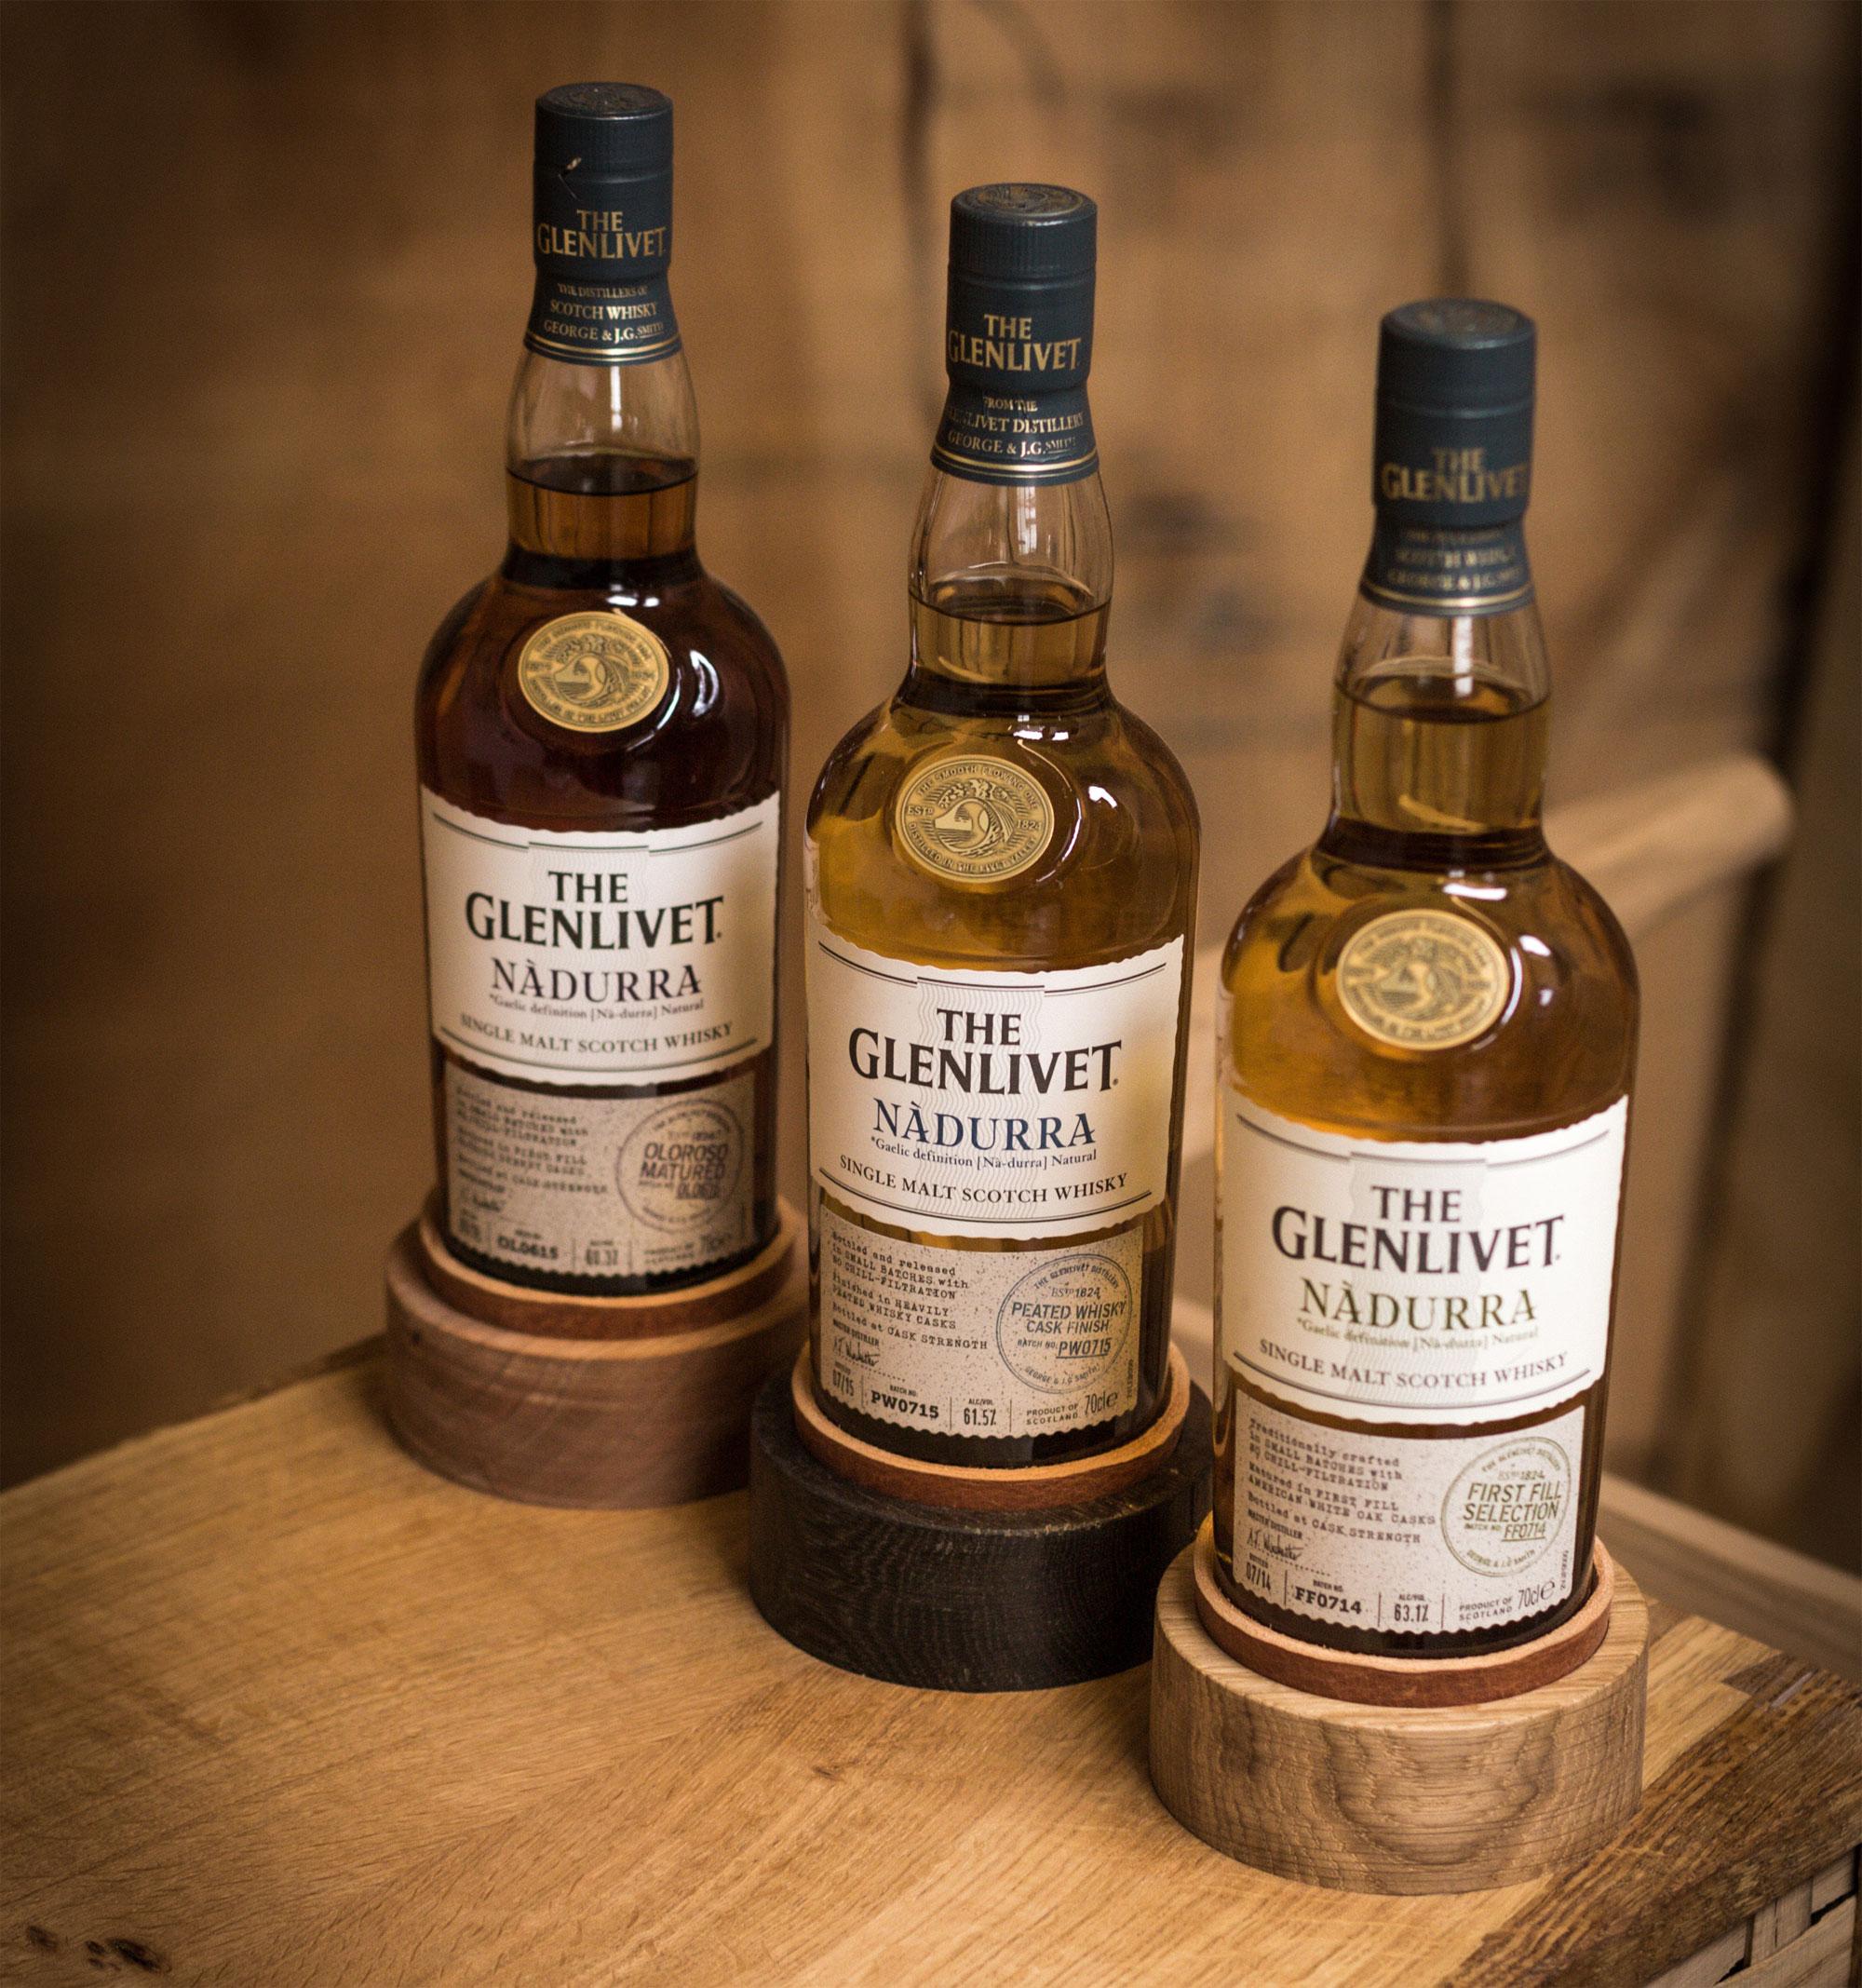 The Glenlivet Nàdurra range of three expressions